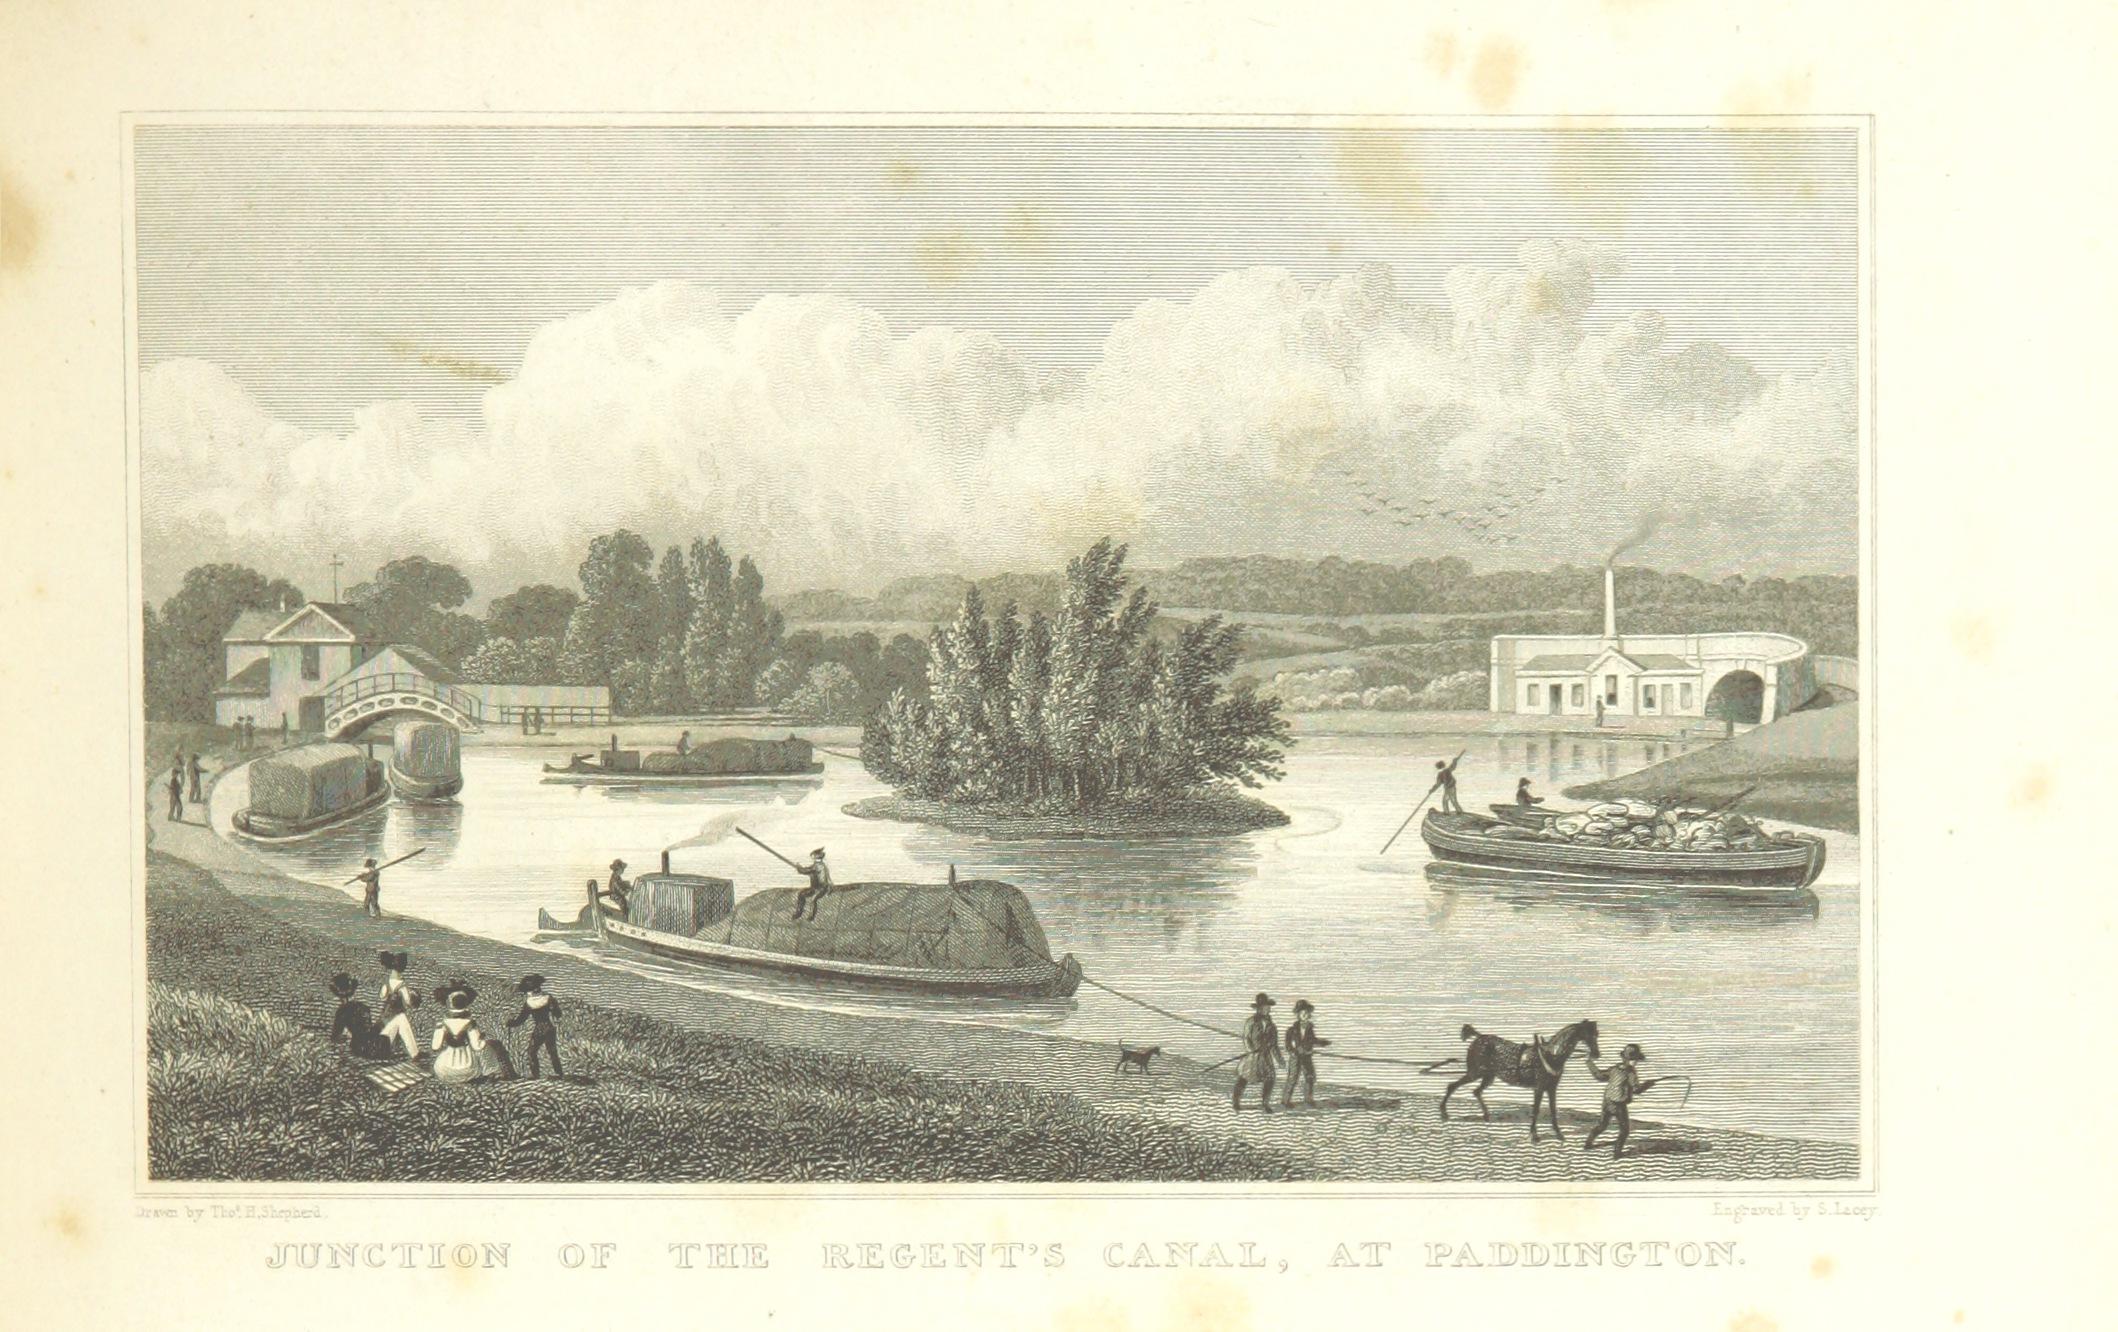 Regent's Canal at Paddington, 1828